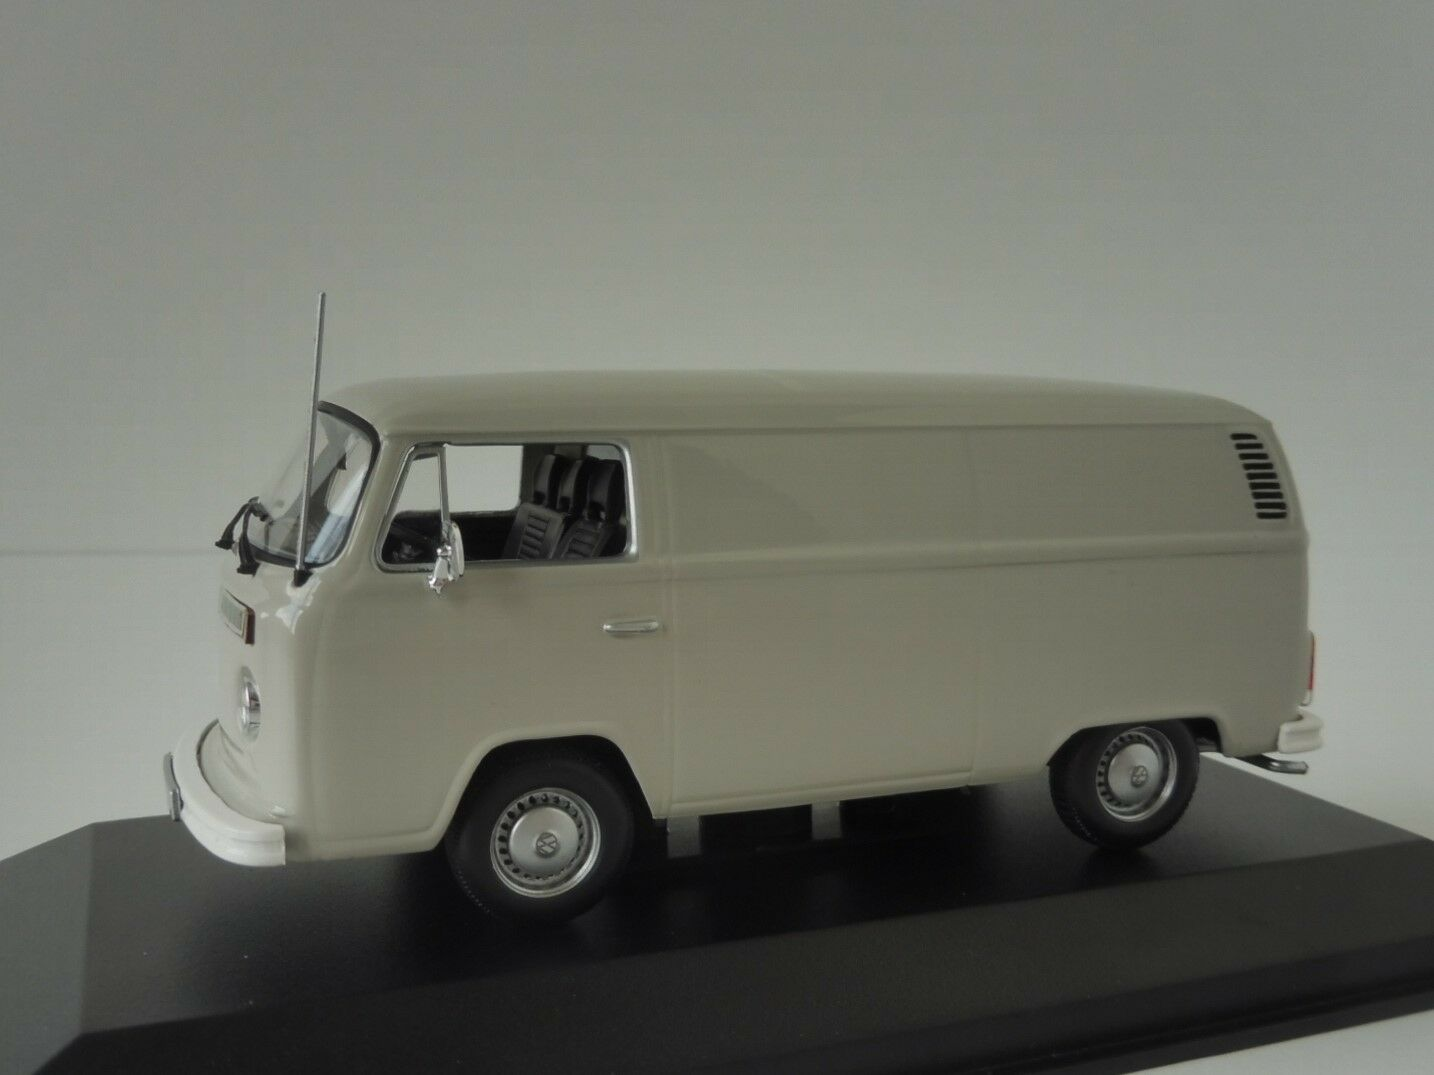 VW T2b 1972 Grau 1 43 Maxichamps by Minichamps 940053060 Volkswagen T2 Bulli  | New Product 2019